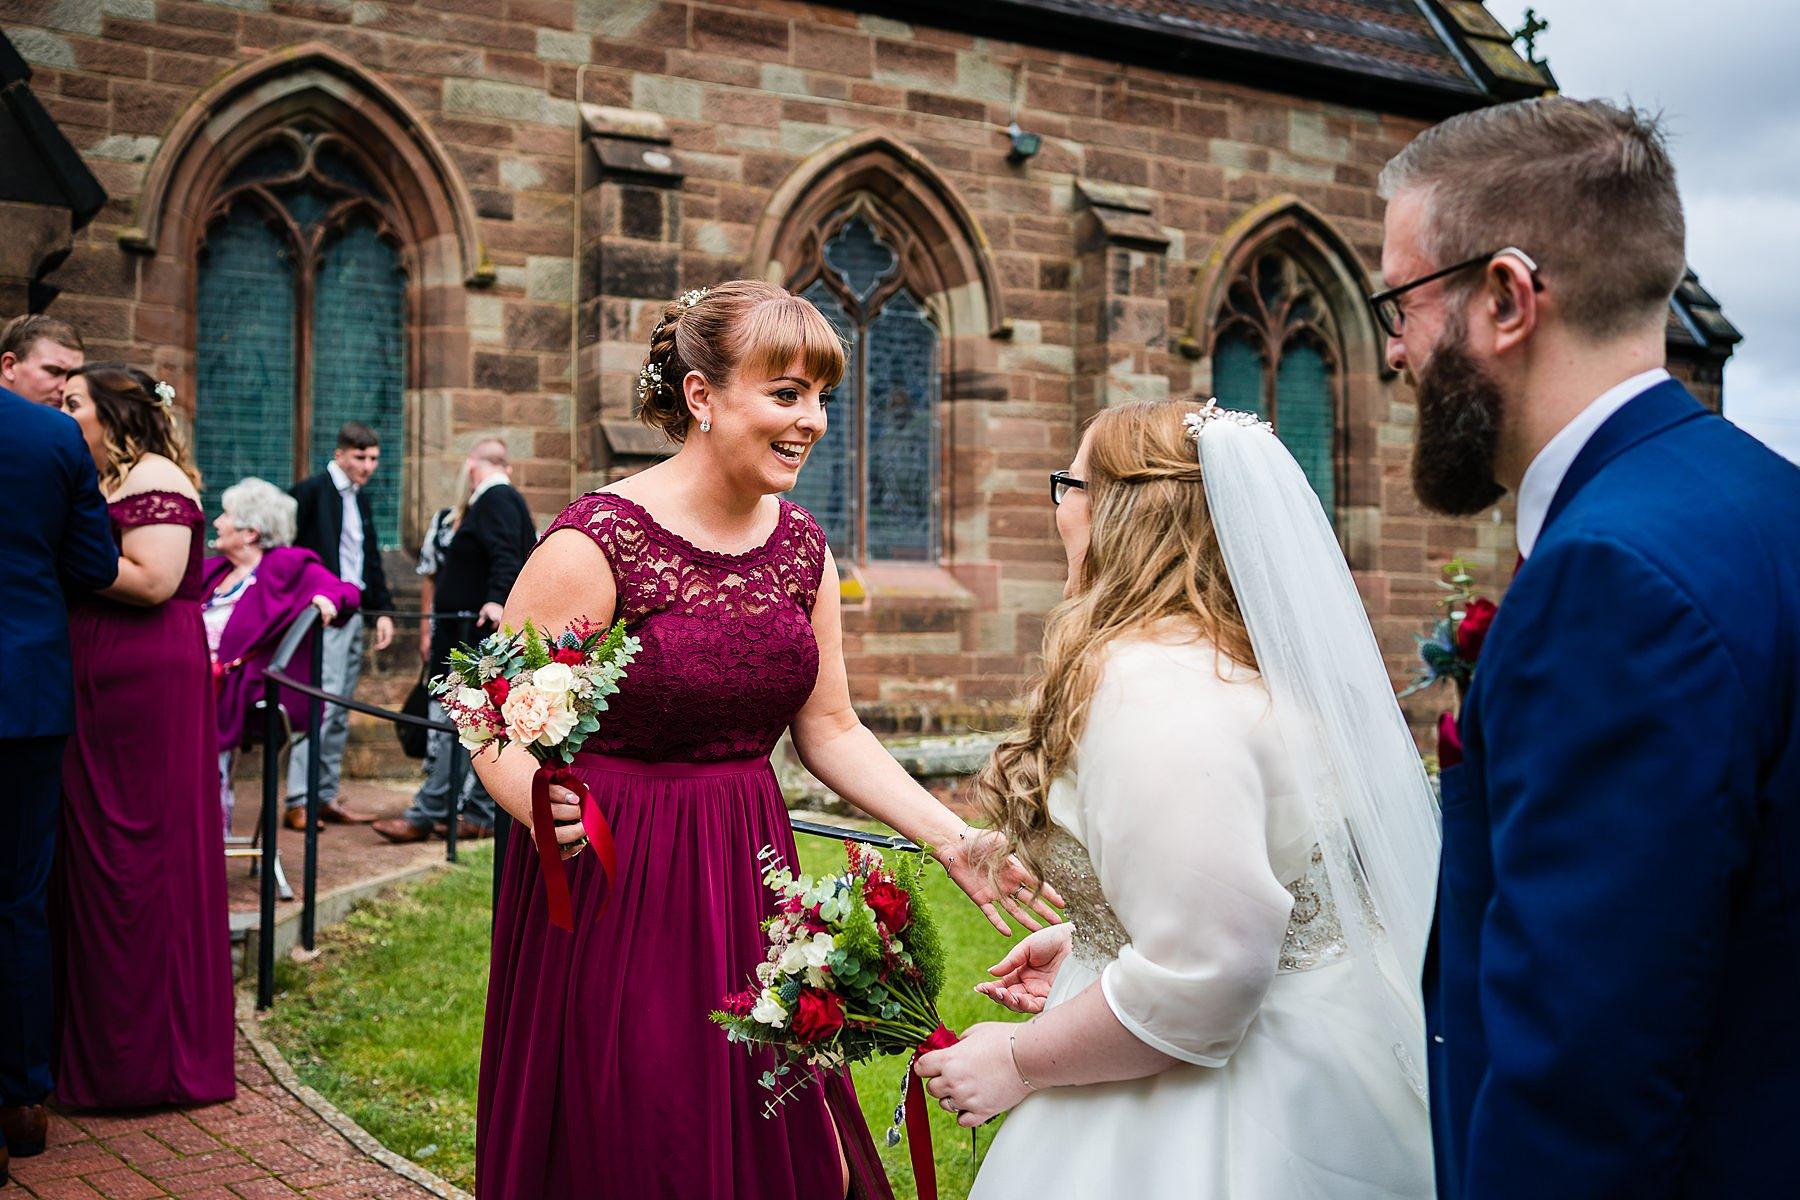 bride and groom greet guests